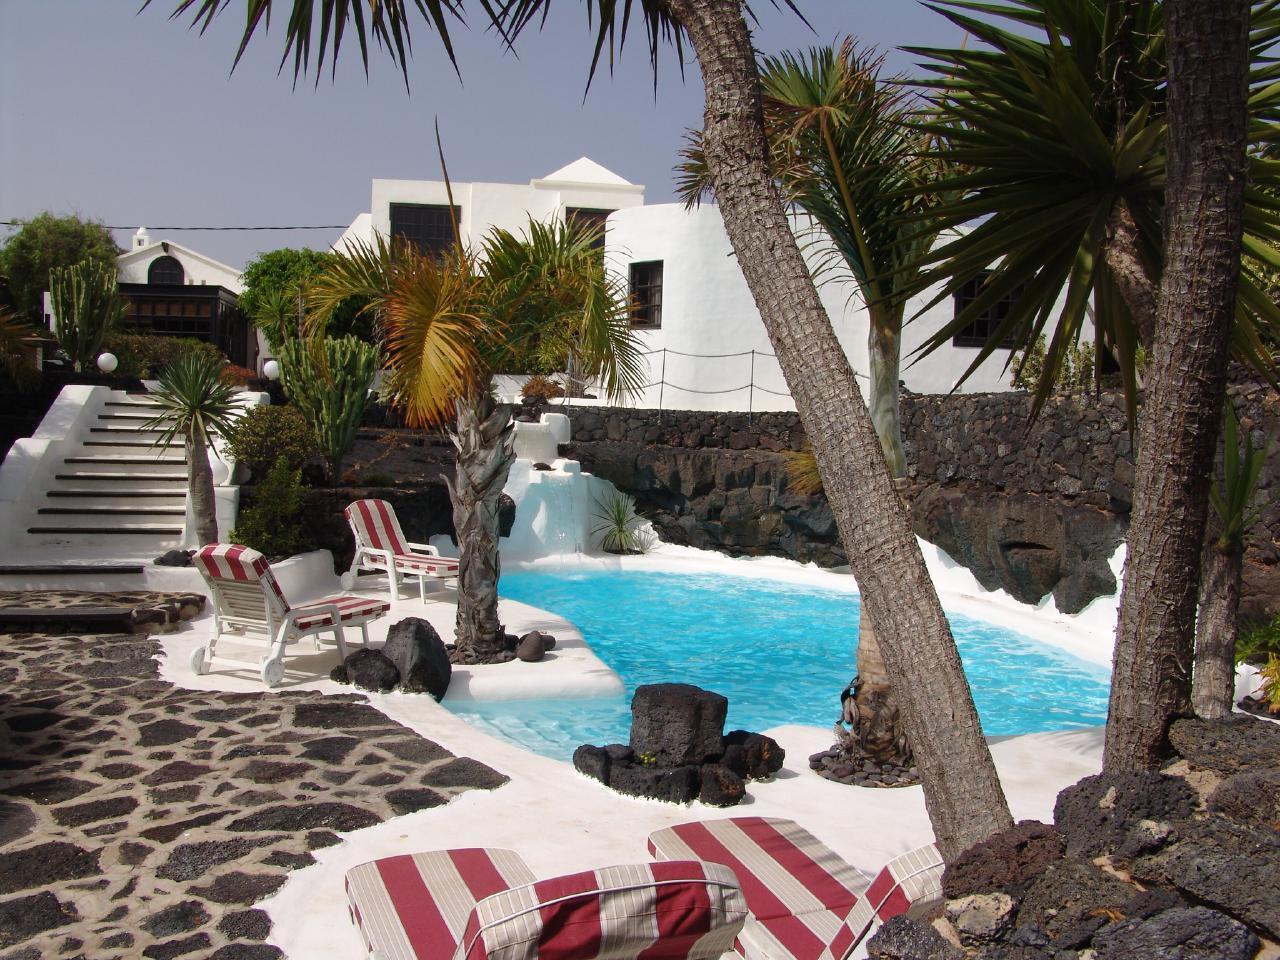 Holiday house CASA TEIGA ESTRELLA 3 Schlafzimmern VILLA MIT POOL (1682021), Tahiche, Lanzarote, Canary Islands, Spain, picture 5